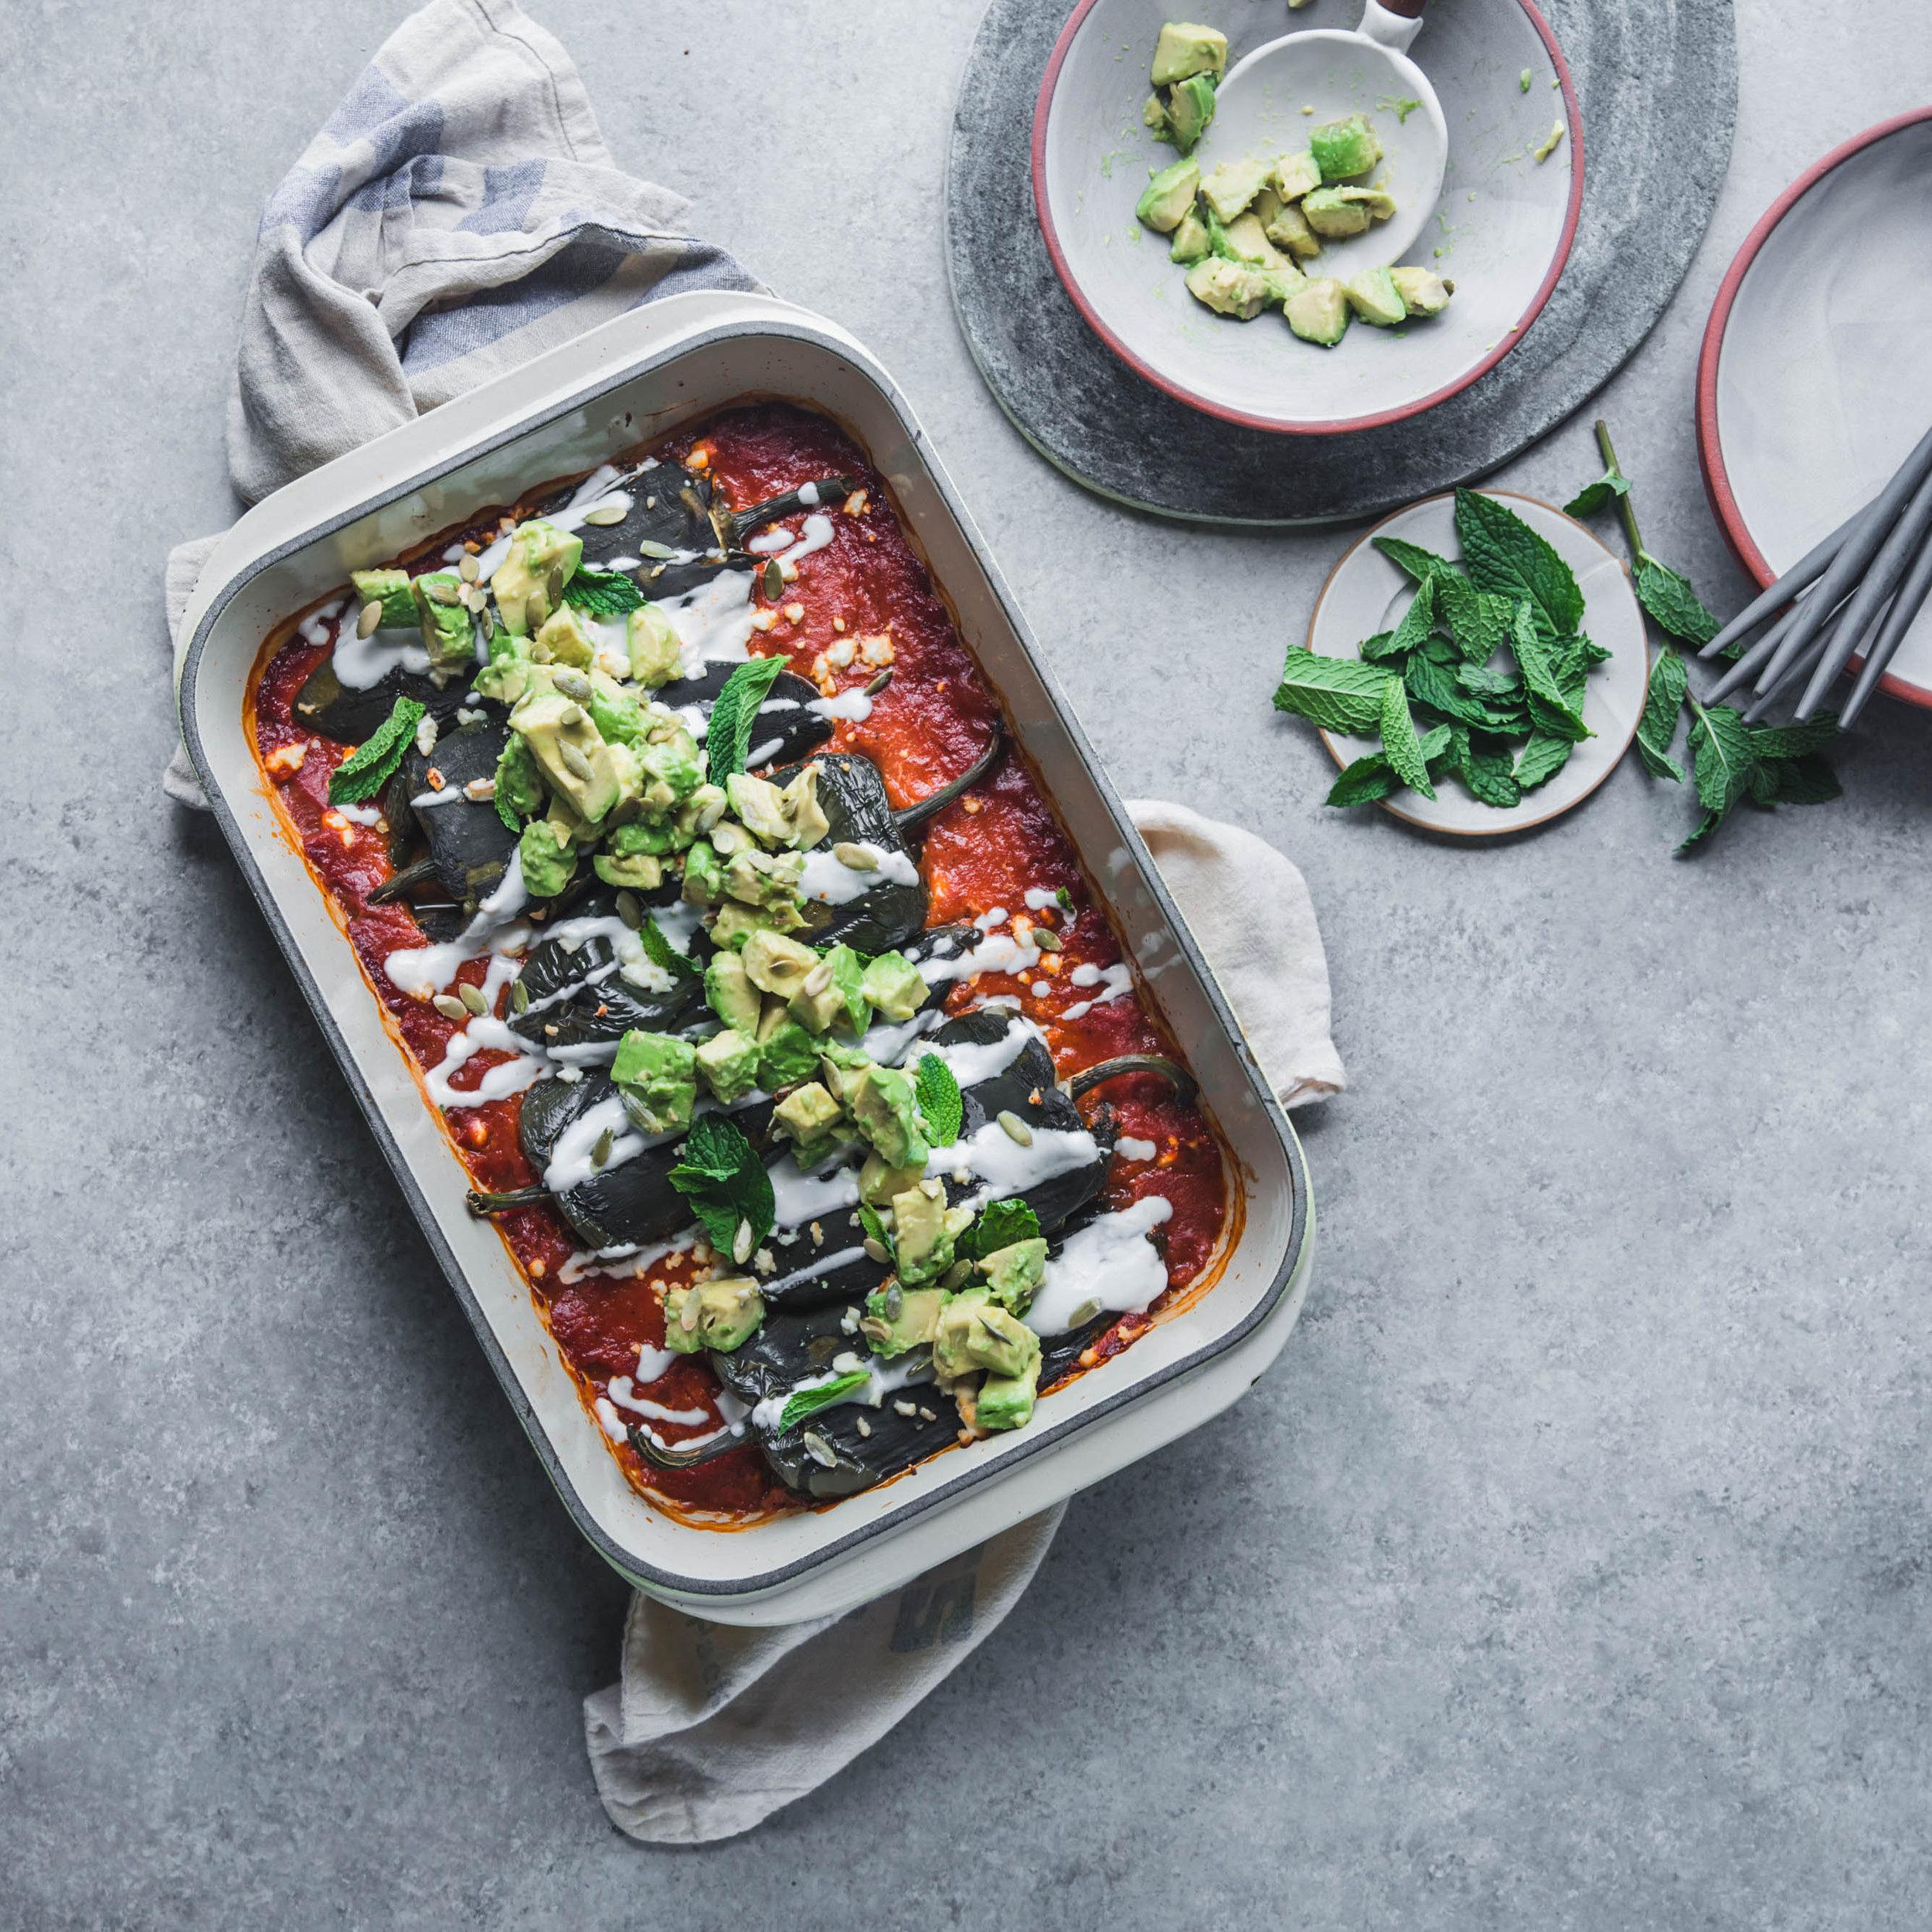 FURTHERMORE FROM EQUINOX  3 Feel-Good Cinco de Mayo Recipes, May 2018